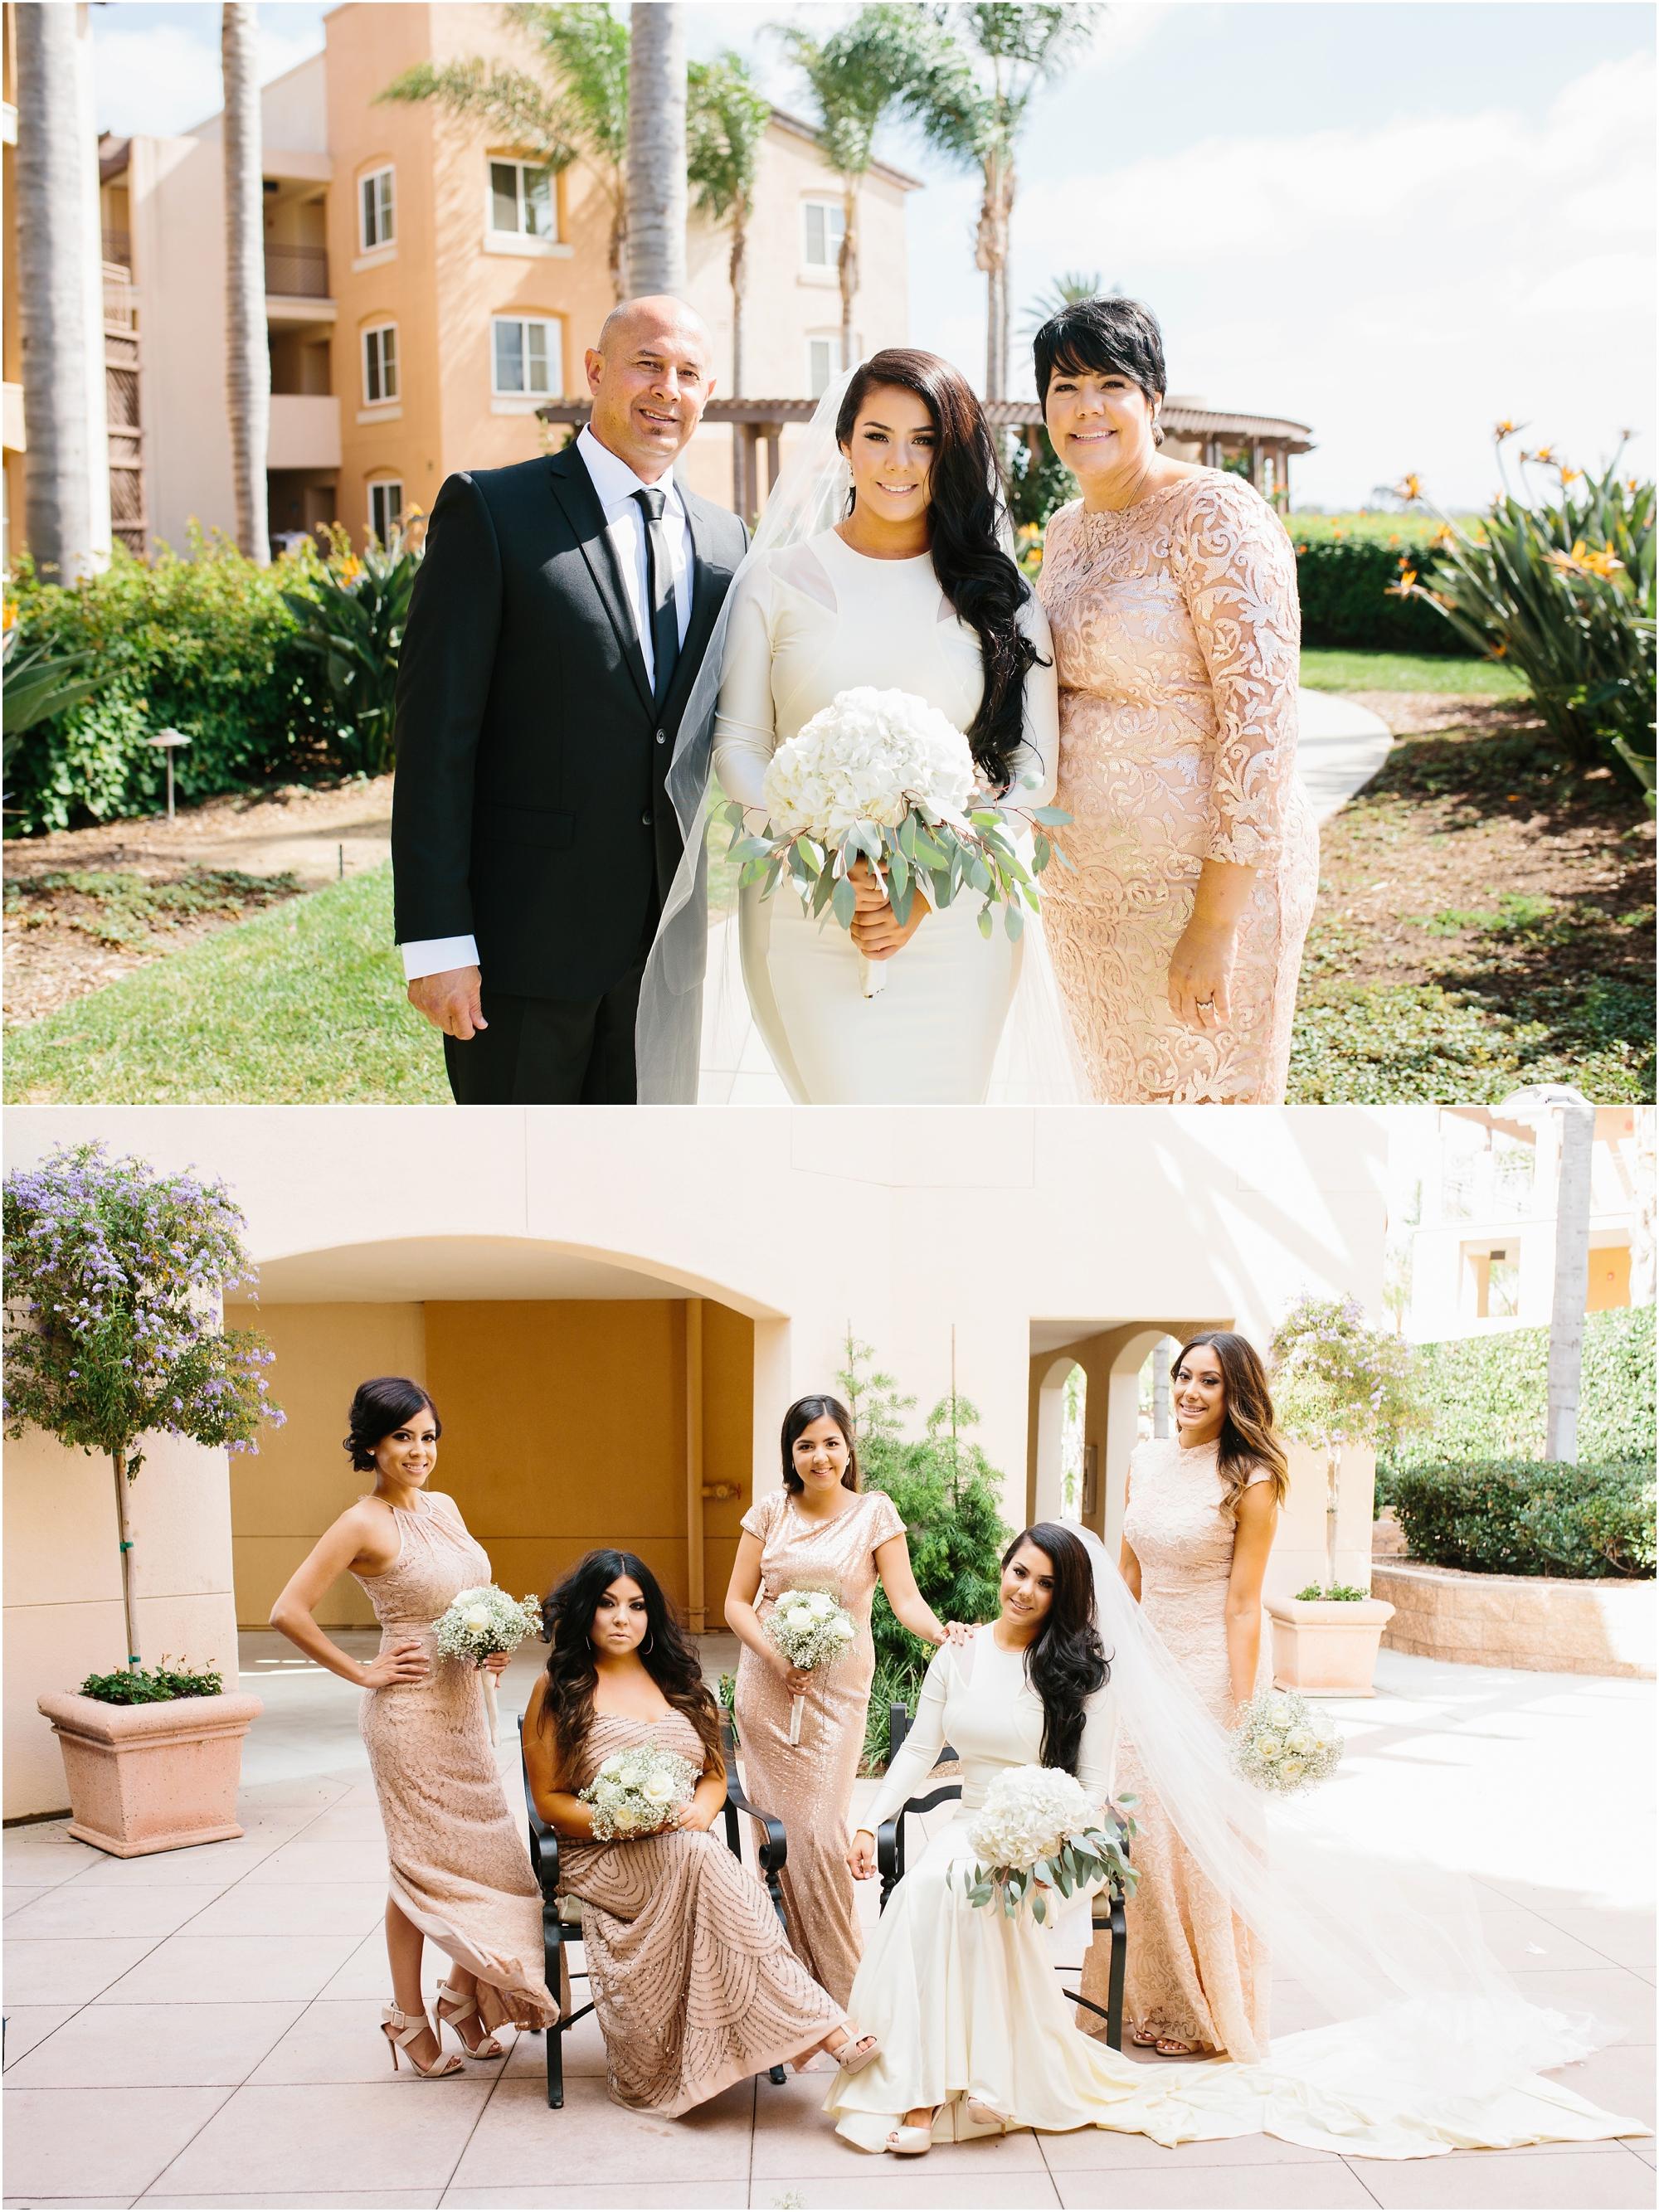 Carlsbad San Diego Wedding - http://brittneyhannonphotography.com